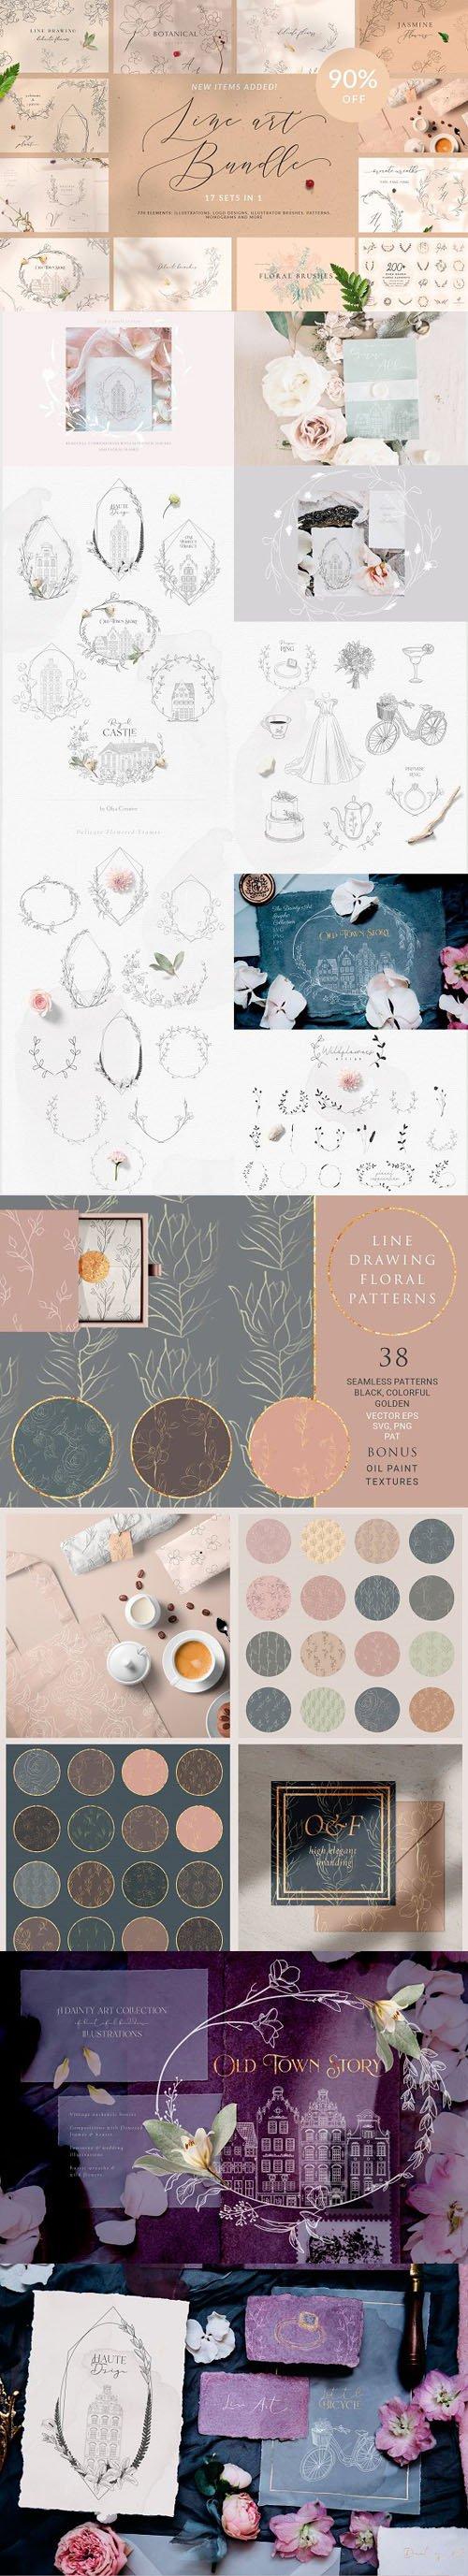 Line Art Bundle - Floral Graphic Templates - 12 Sets IN 1